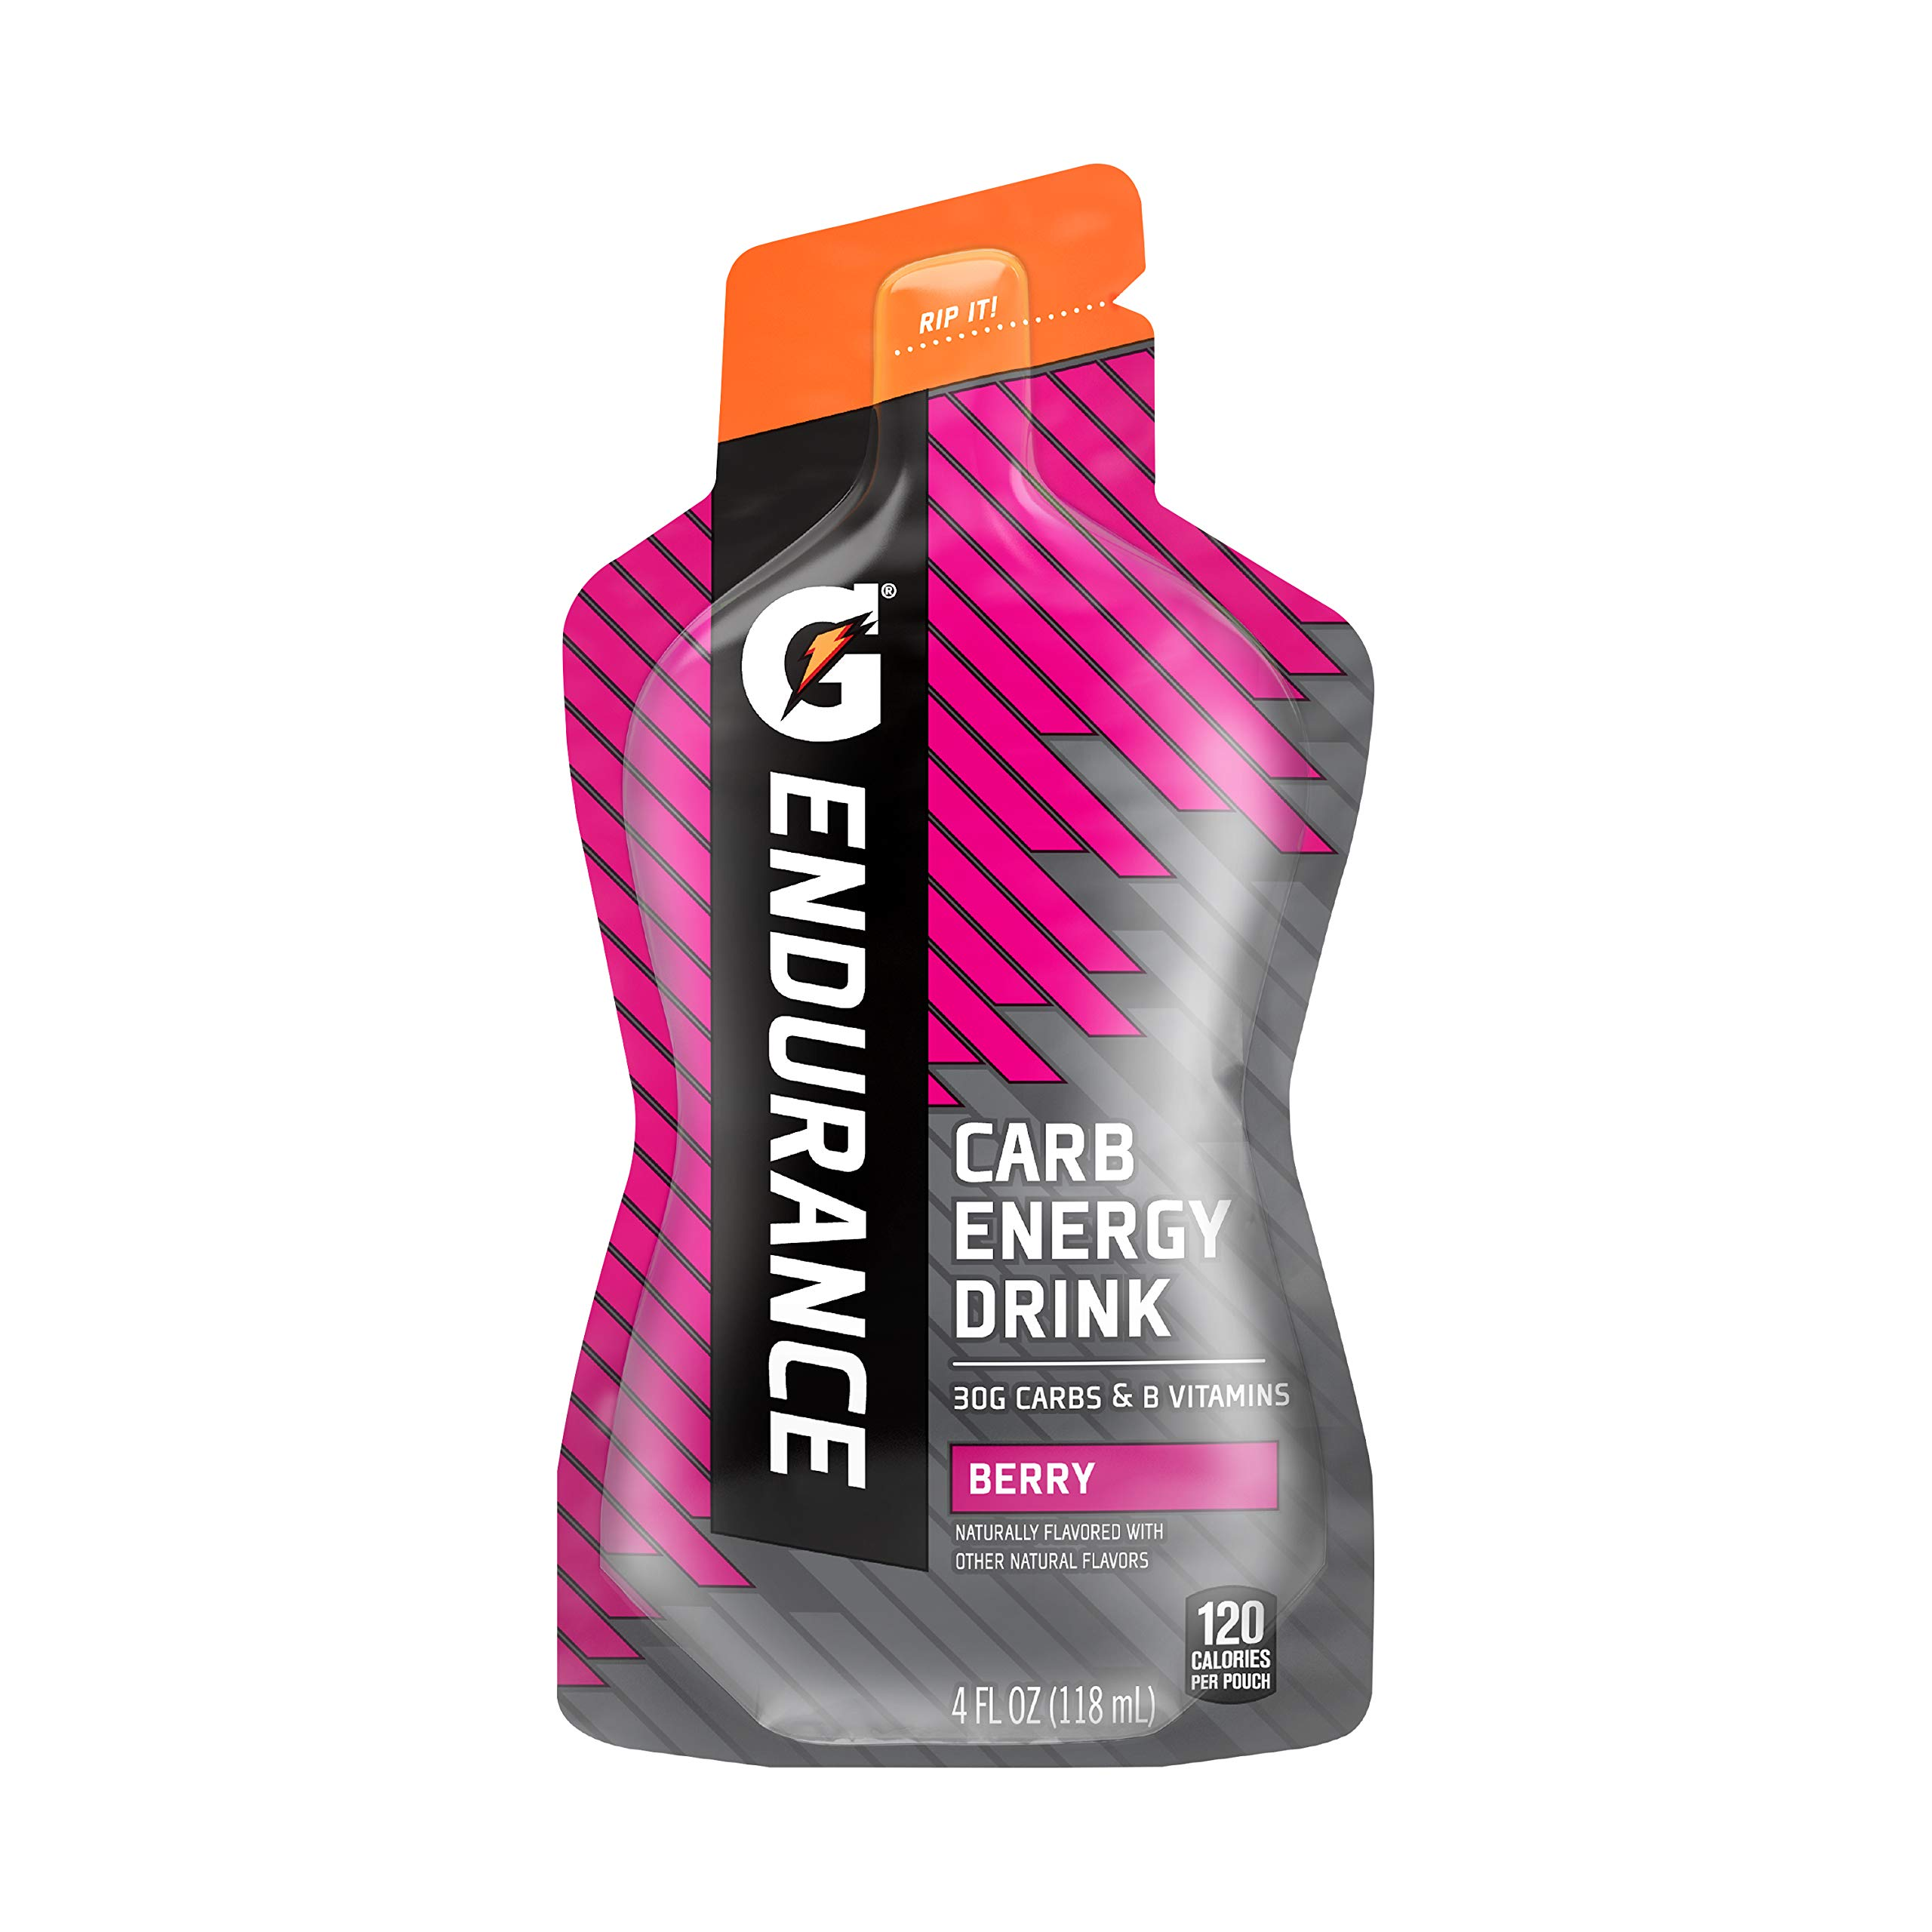 Gatorade Towels Amazon: Amazon.com : Gatorade Endurance Carb Energy Drink, Lime, 4